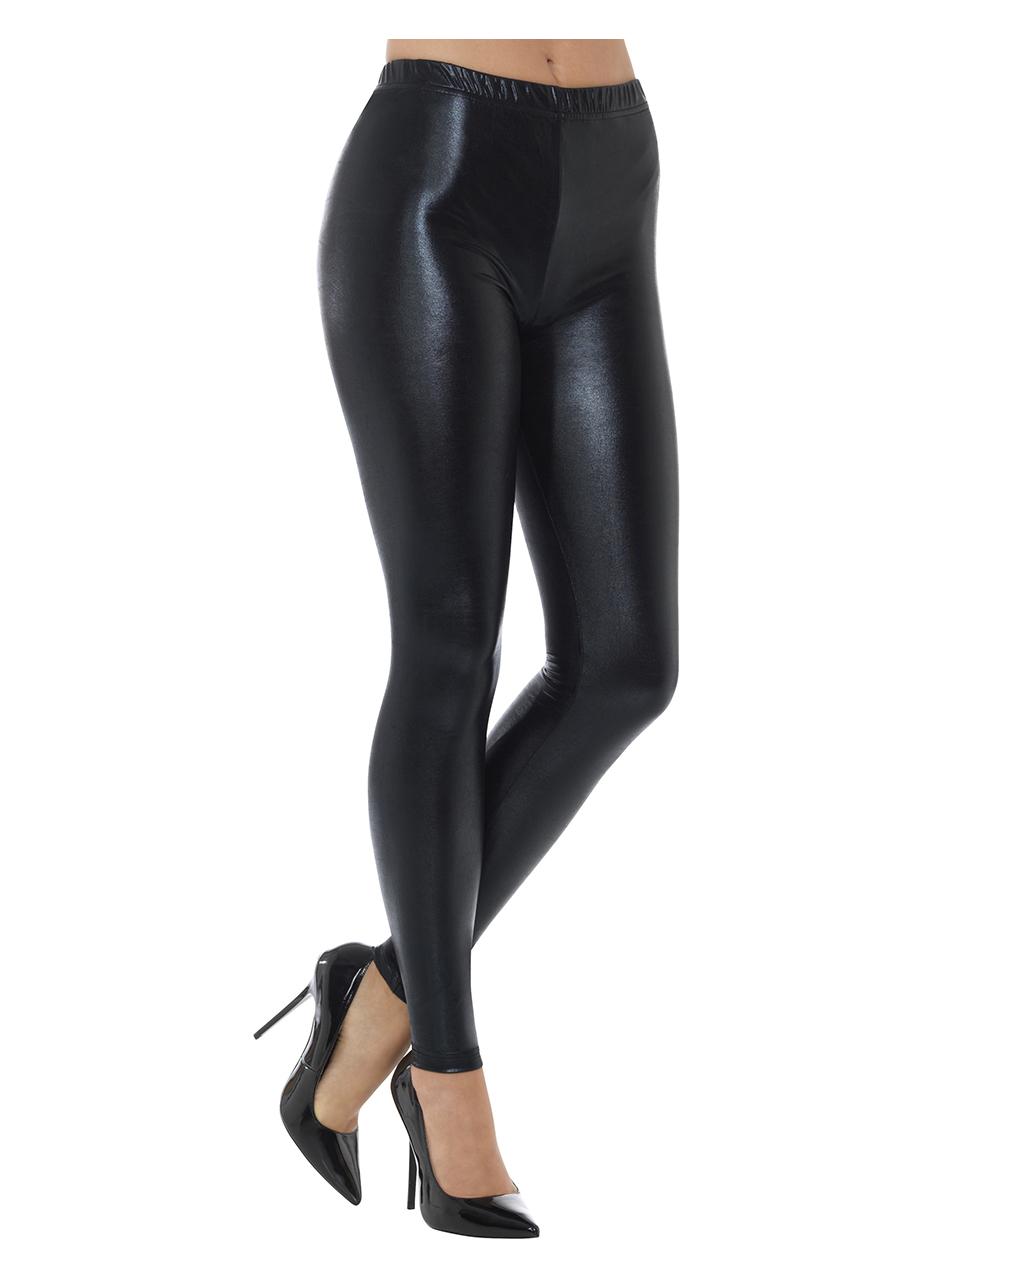 bfc4aac56bd0f 80s Metallic Leggings Black   Costume Accessories   horror-shop.com